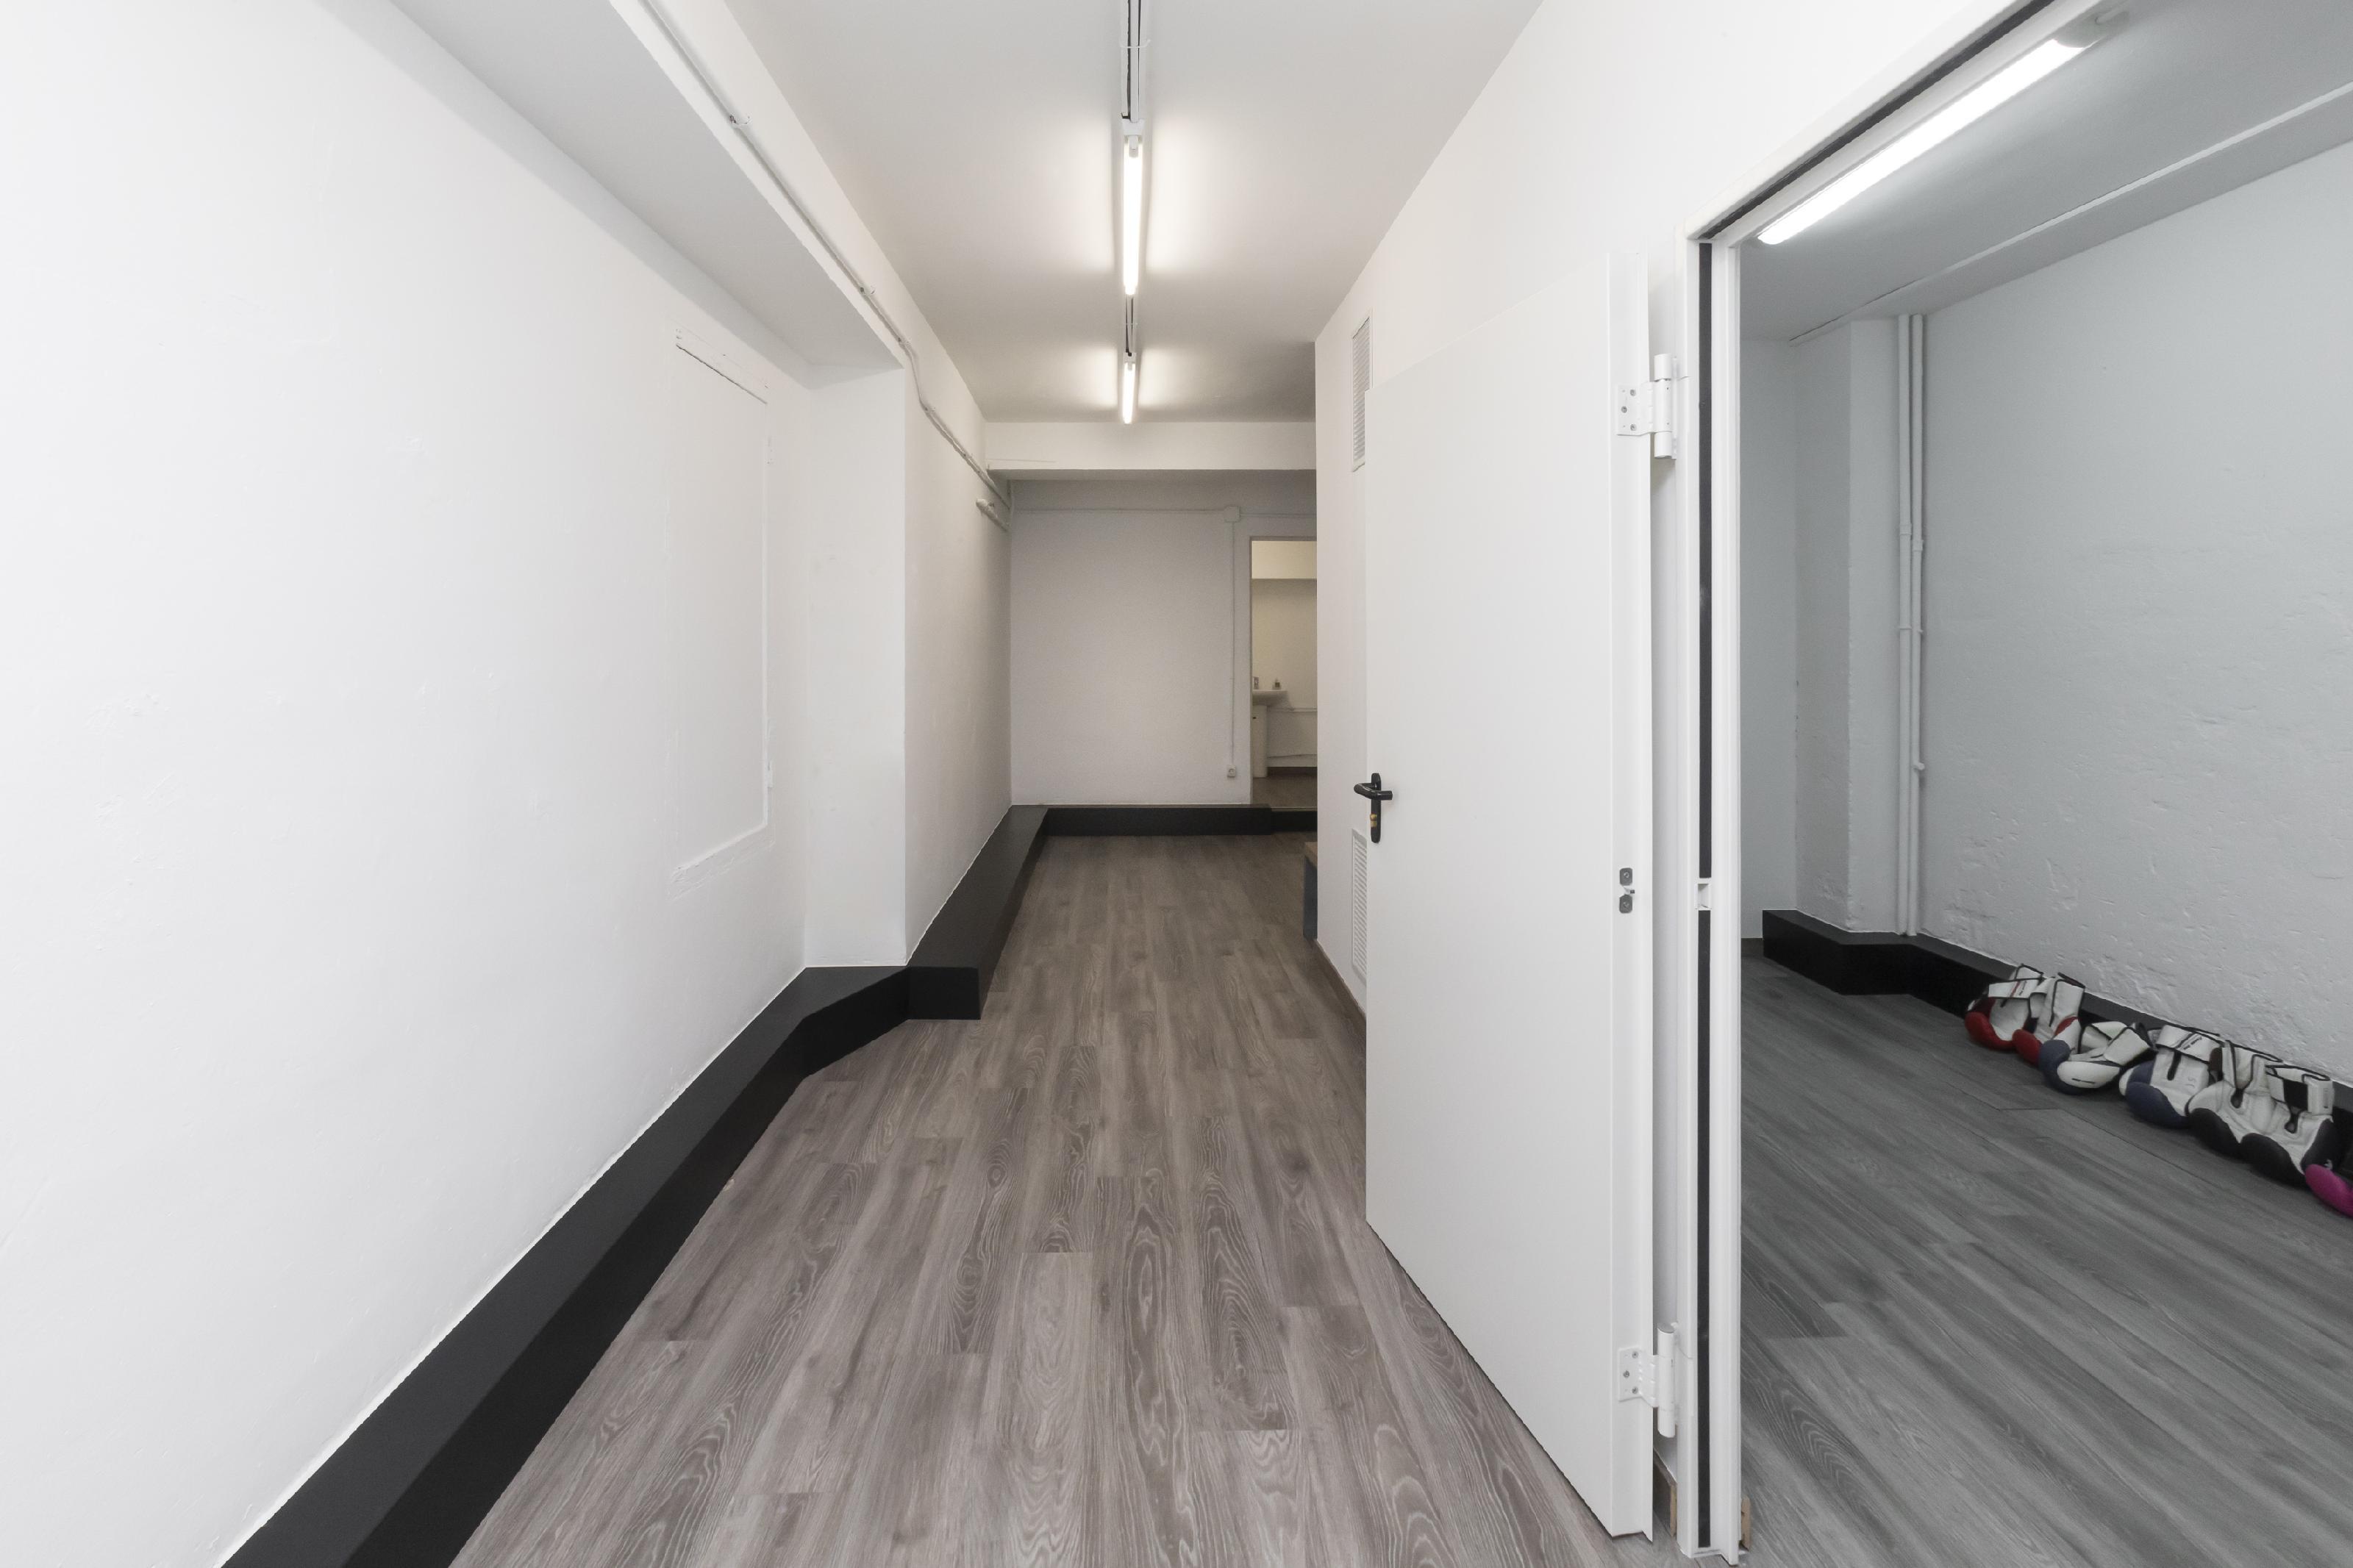 249493 Commercial premises for sale in Sarrià-Sant Gervasi, Sant Gervasi-Galvany 17